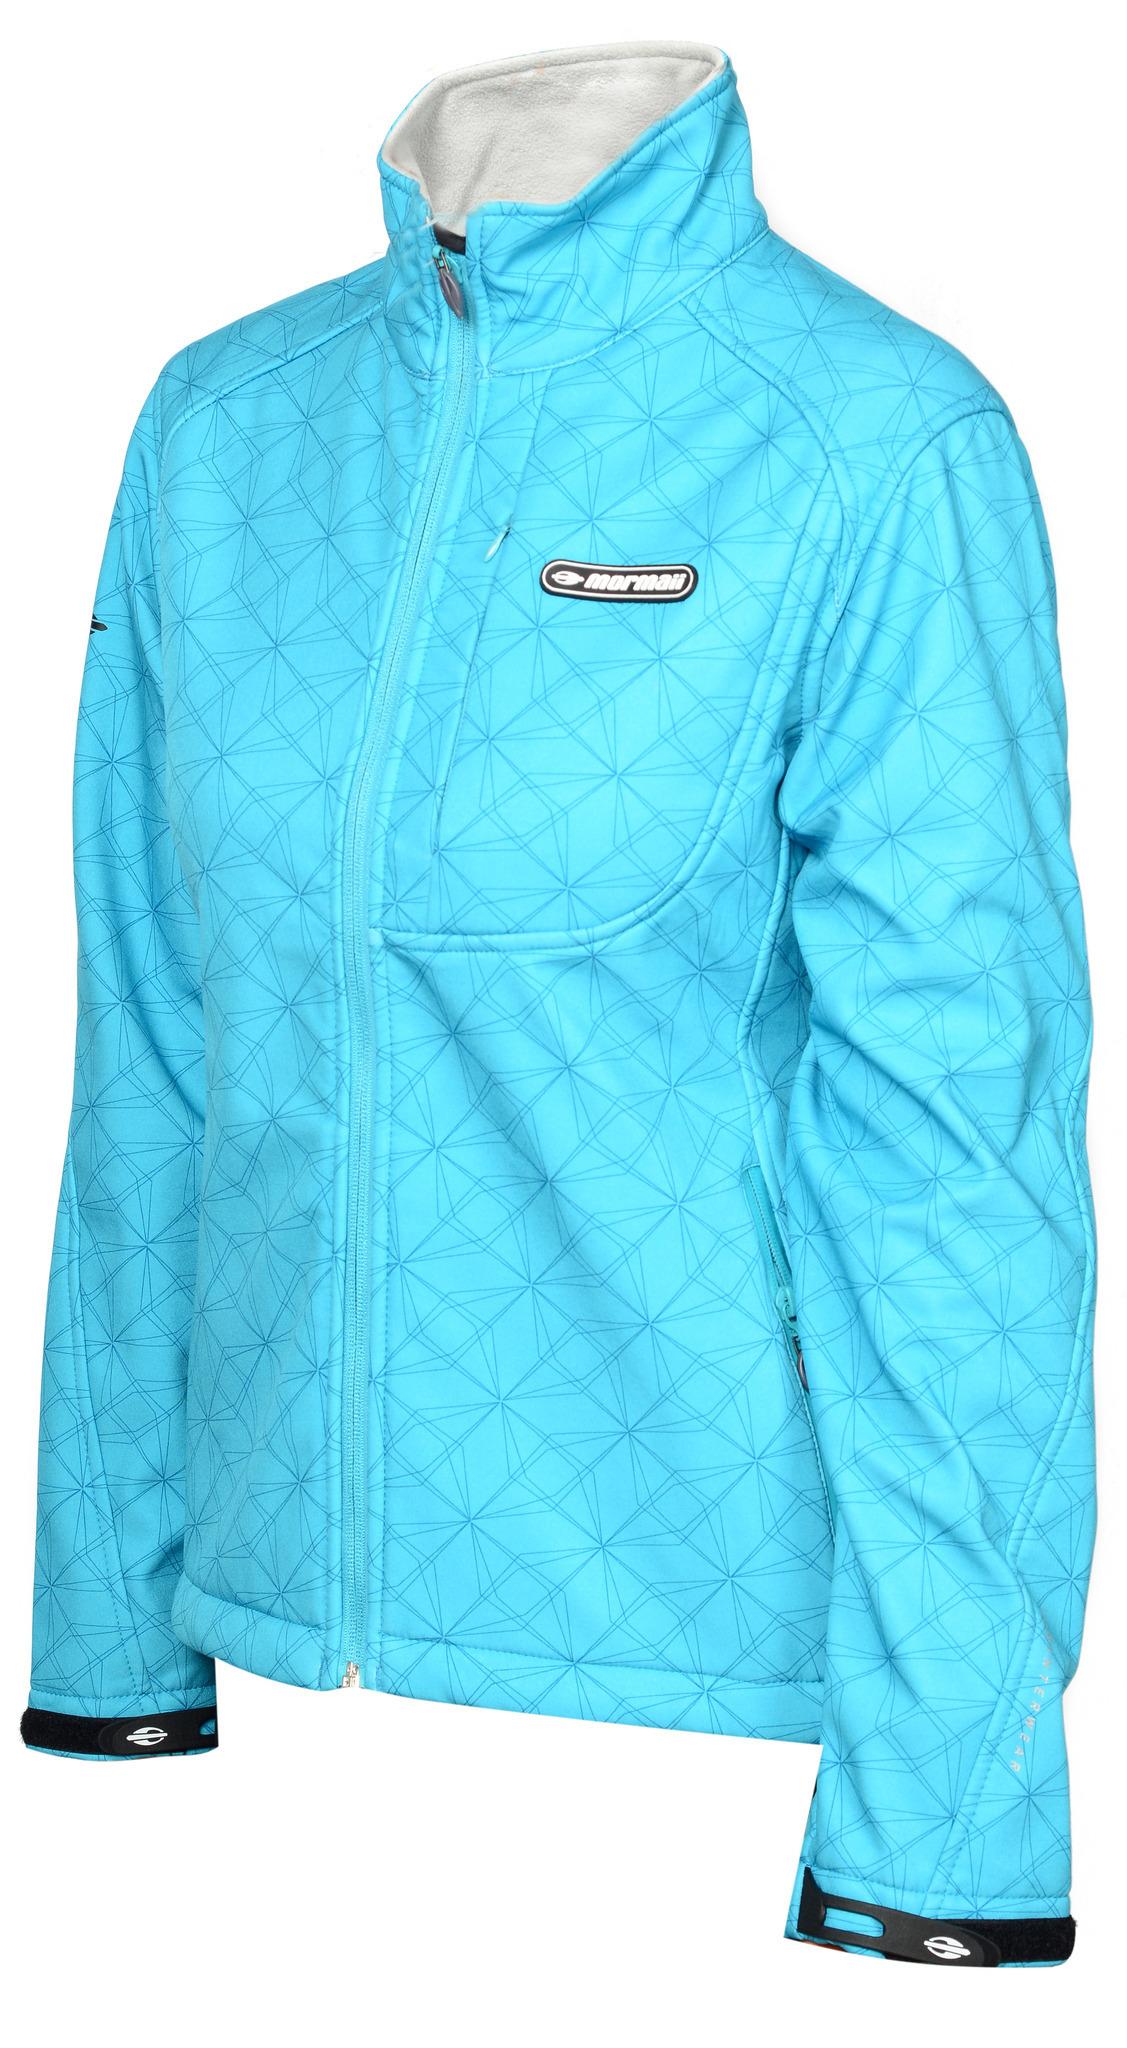 Женская лыжная утепленная куртка Mormaii  Lake Blue (FAMW02)